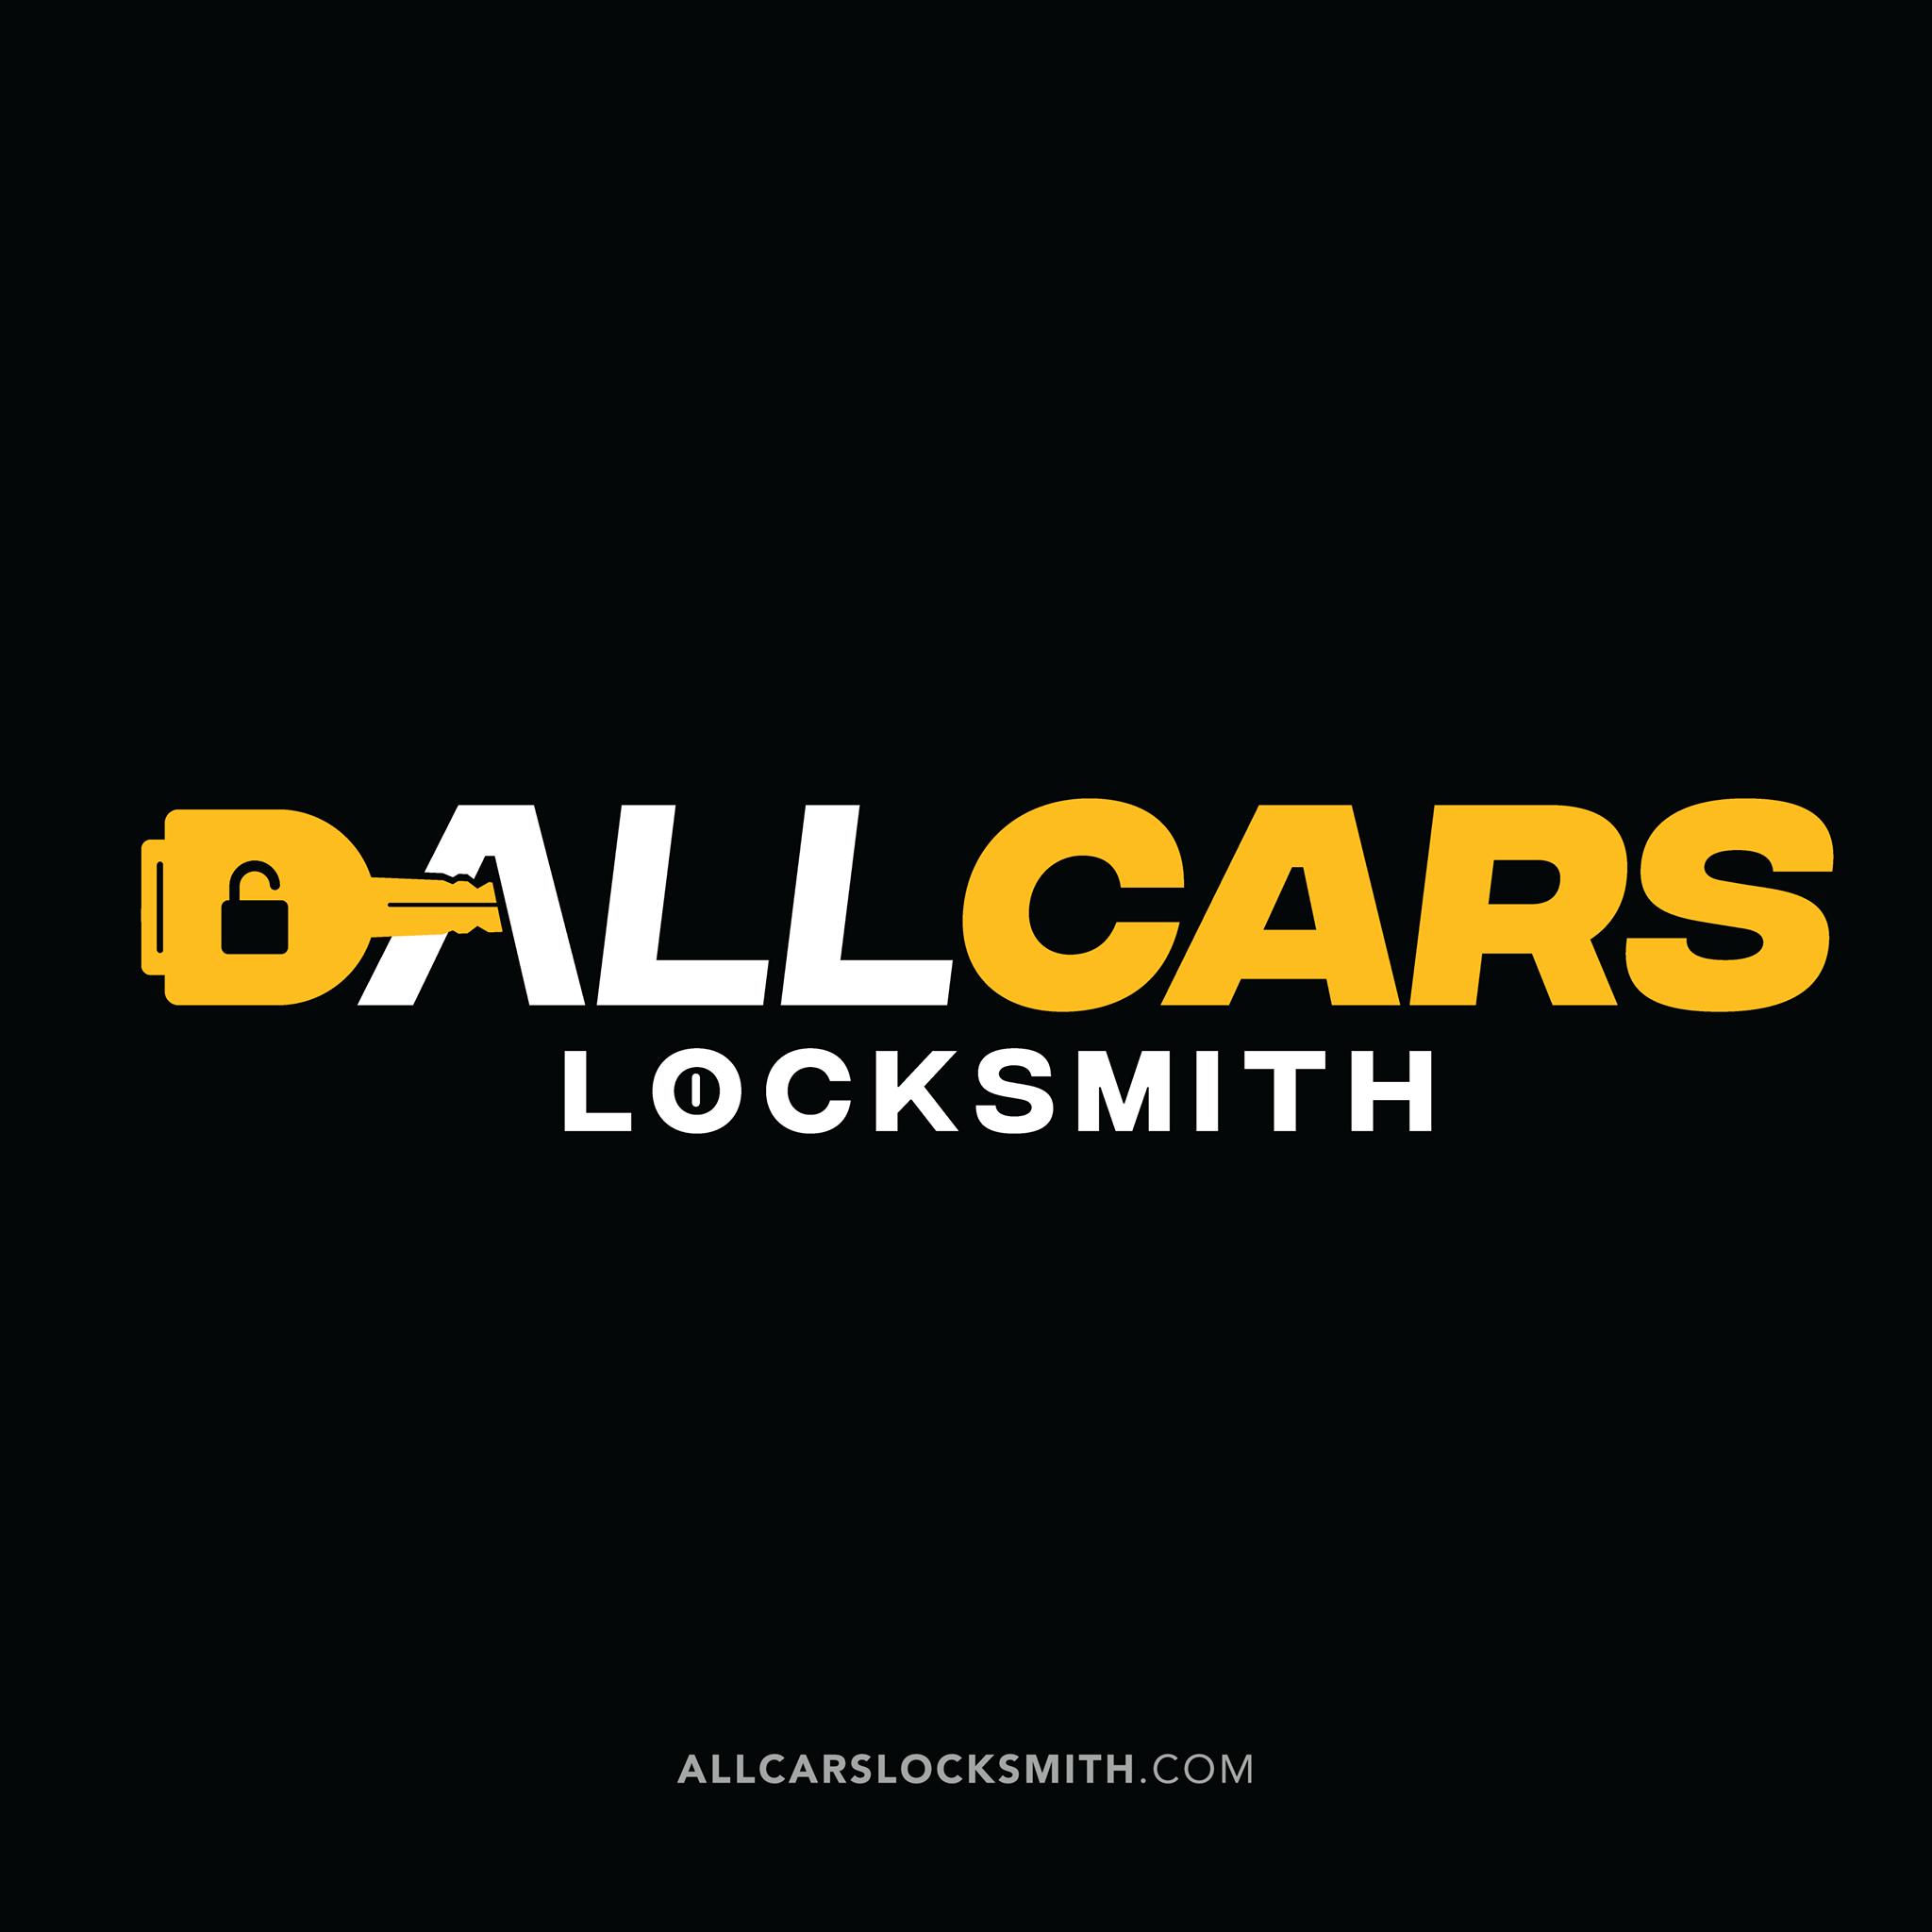 All Cars Locksmith